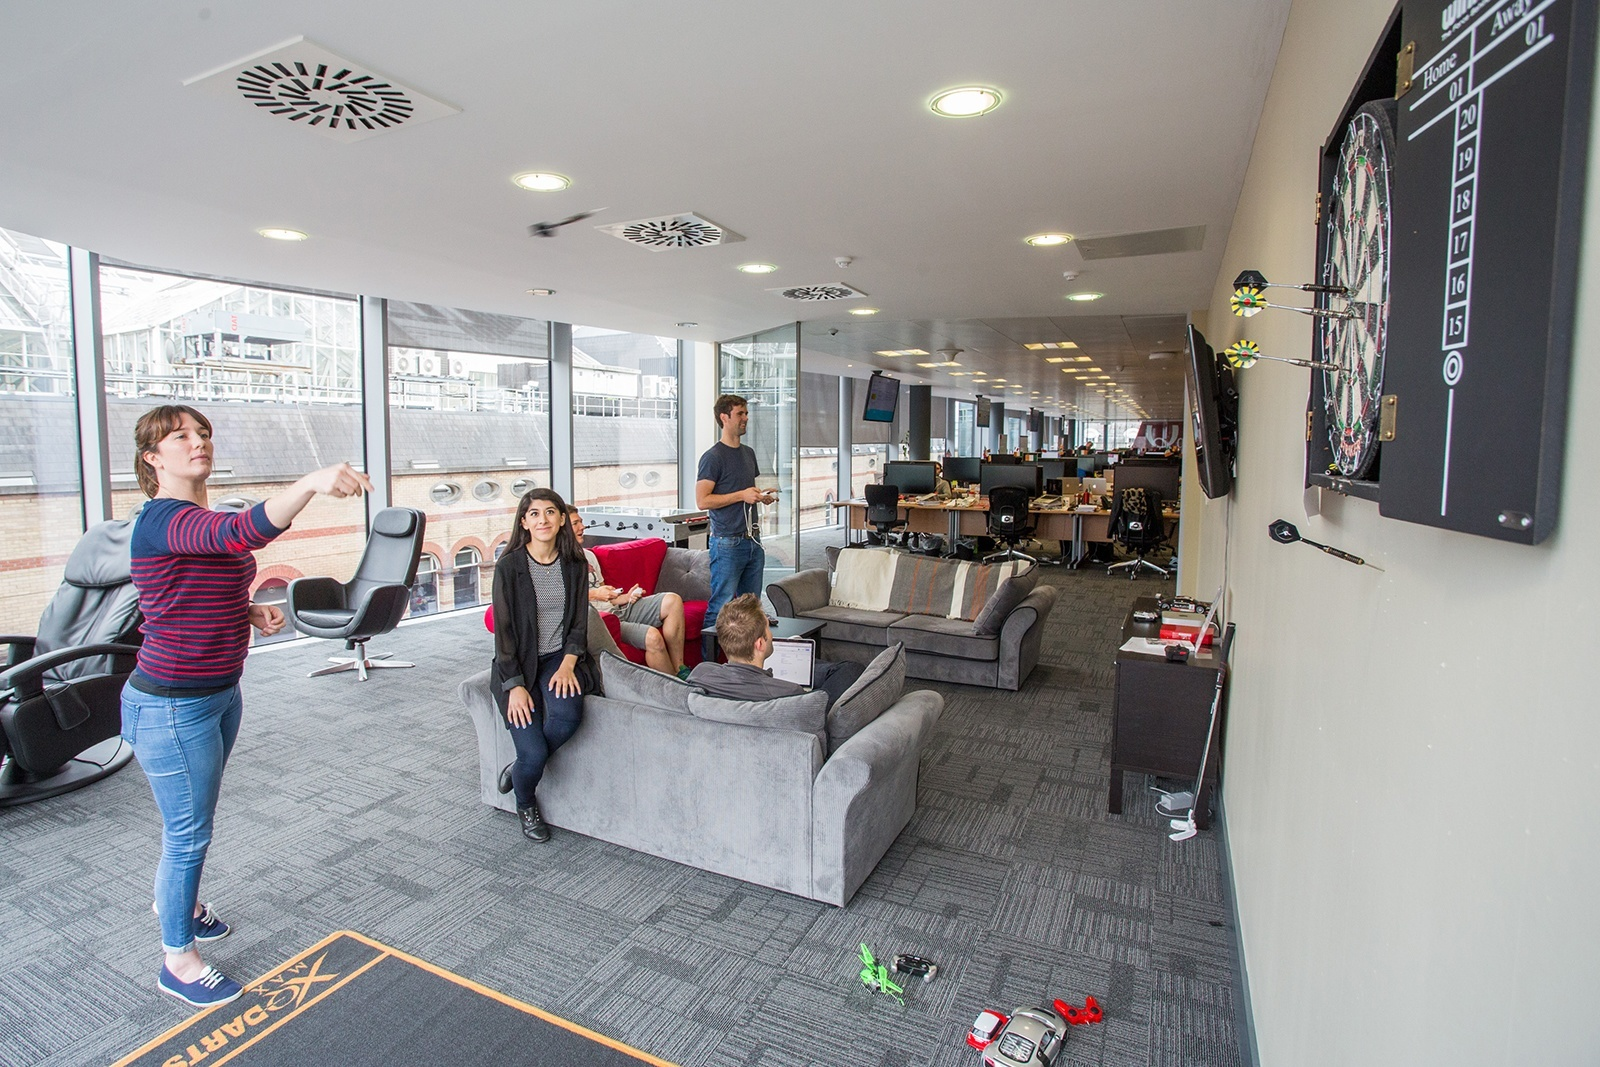 A tour of qualtrics new dublin office officelovin 39 - Irish times office dublin ...